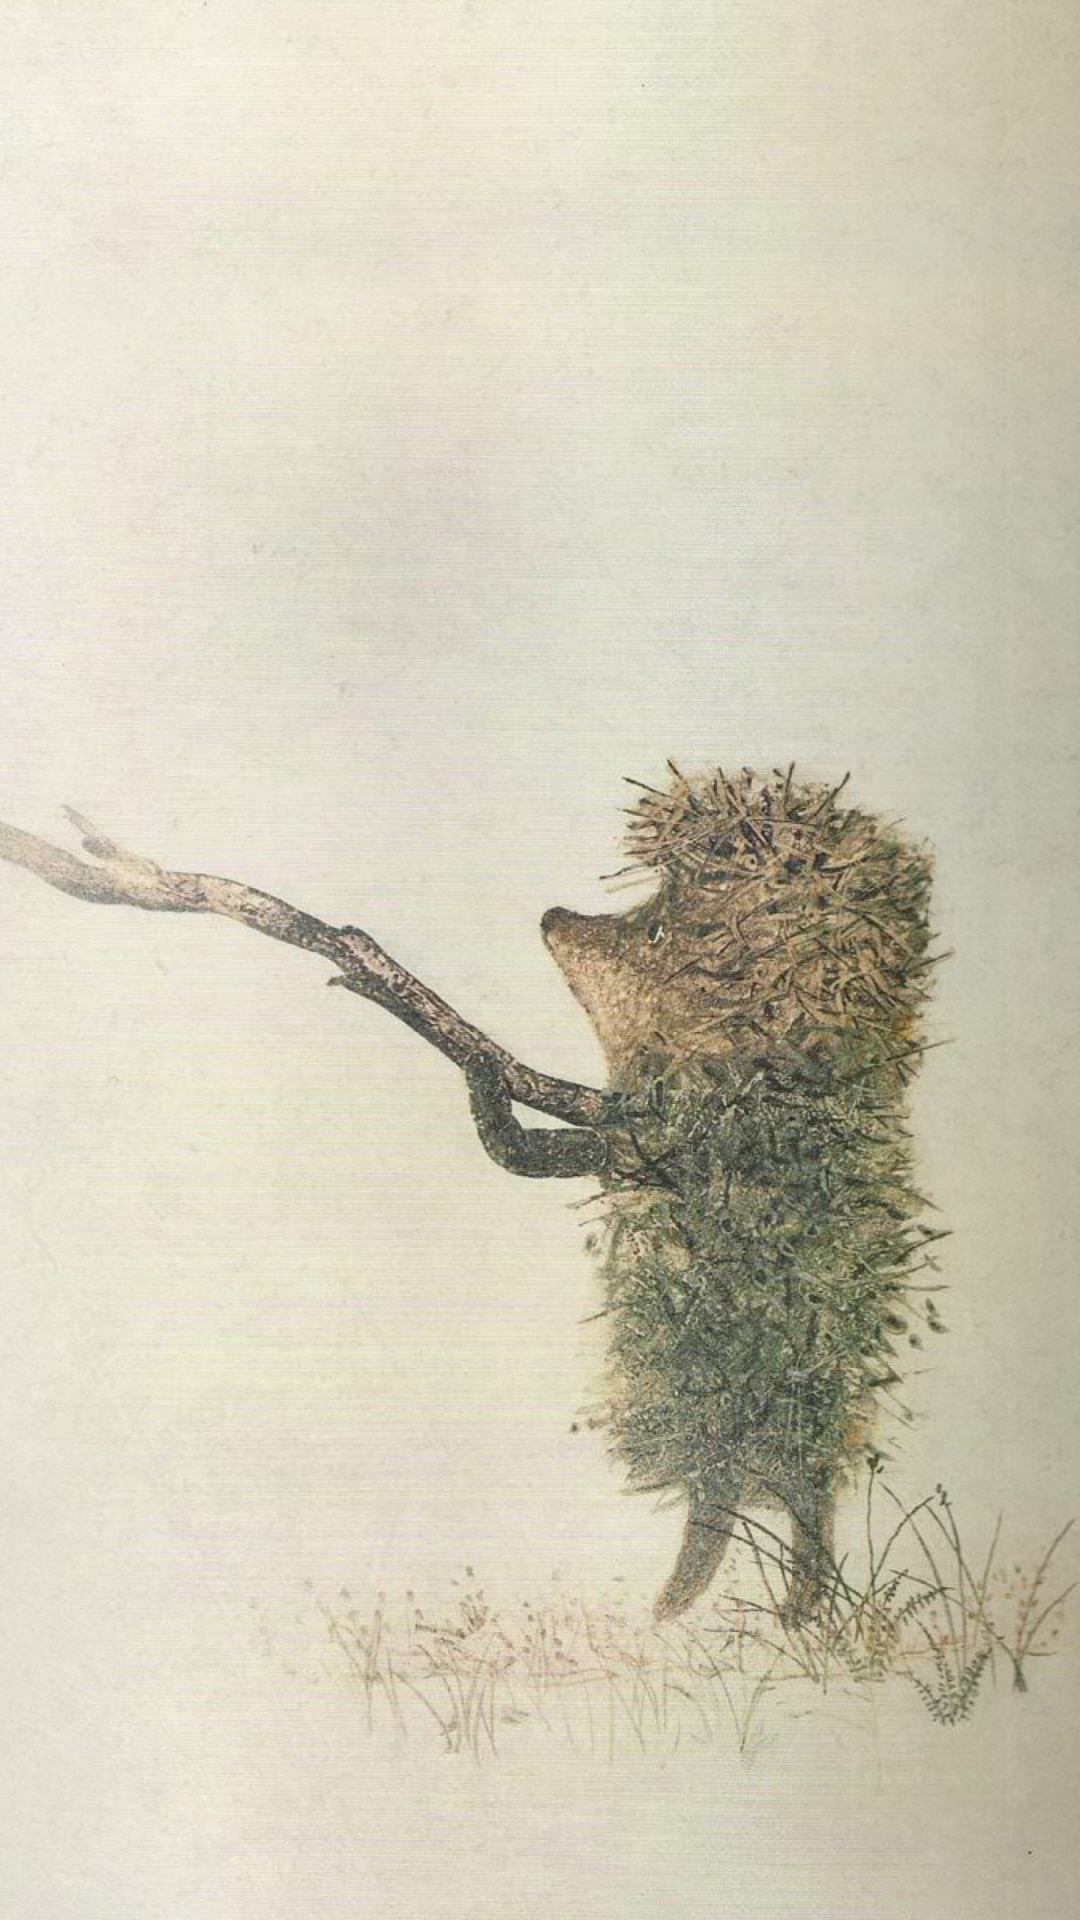 Картинки, сказка в картинках ежик в тумане